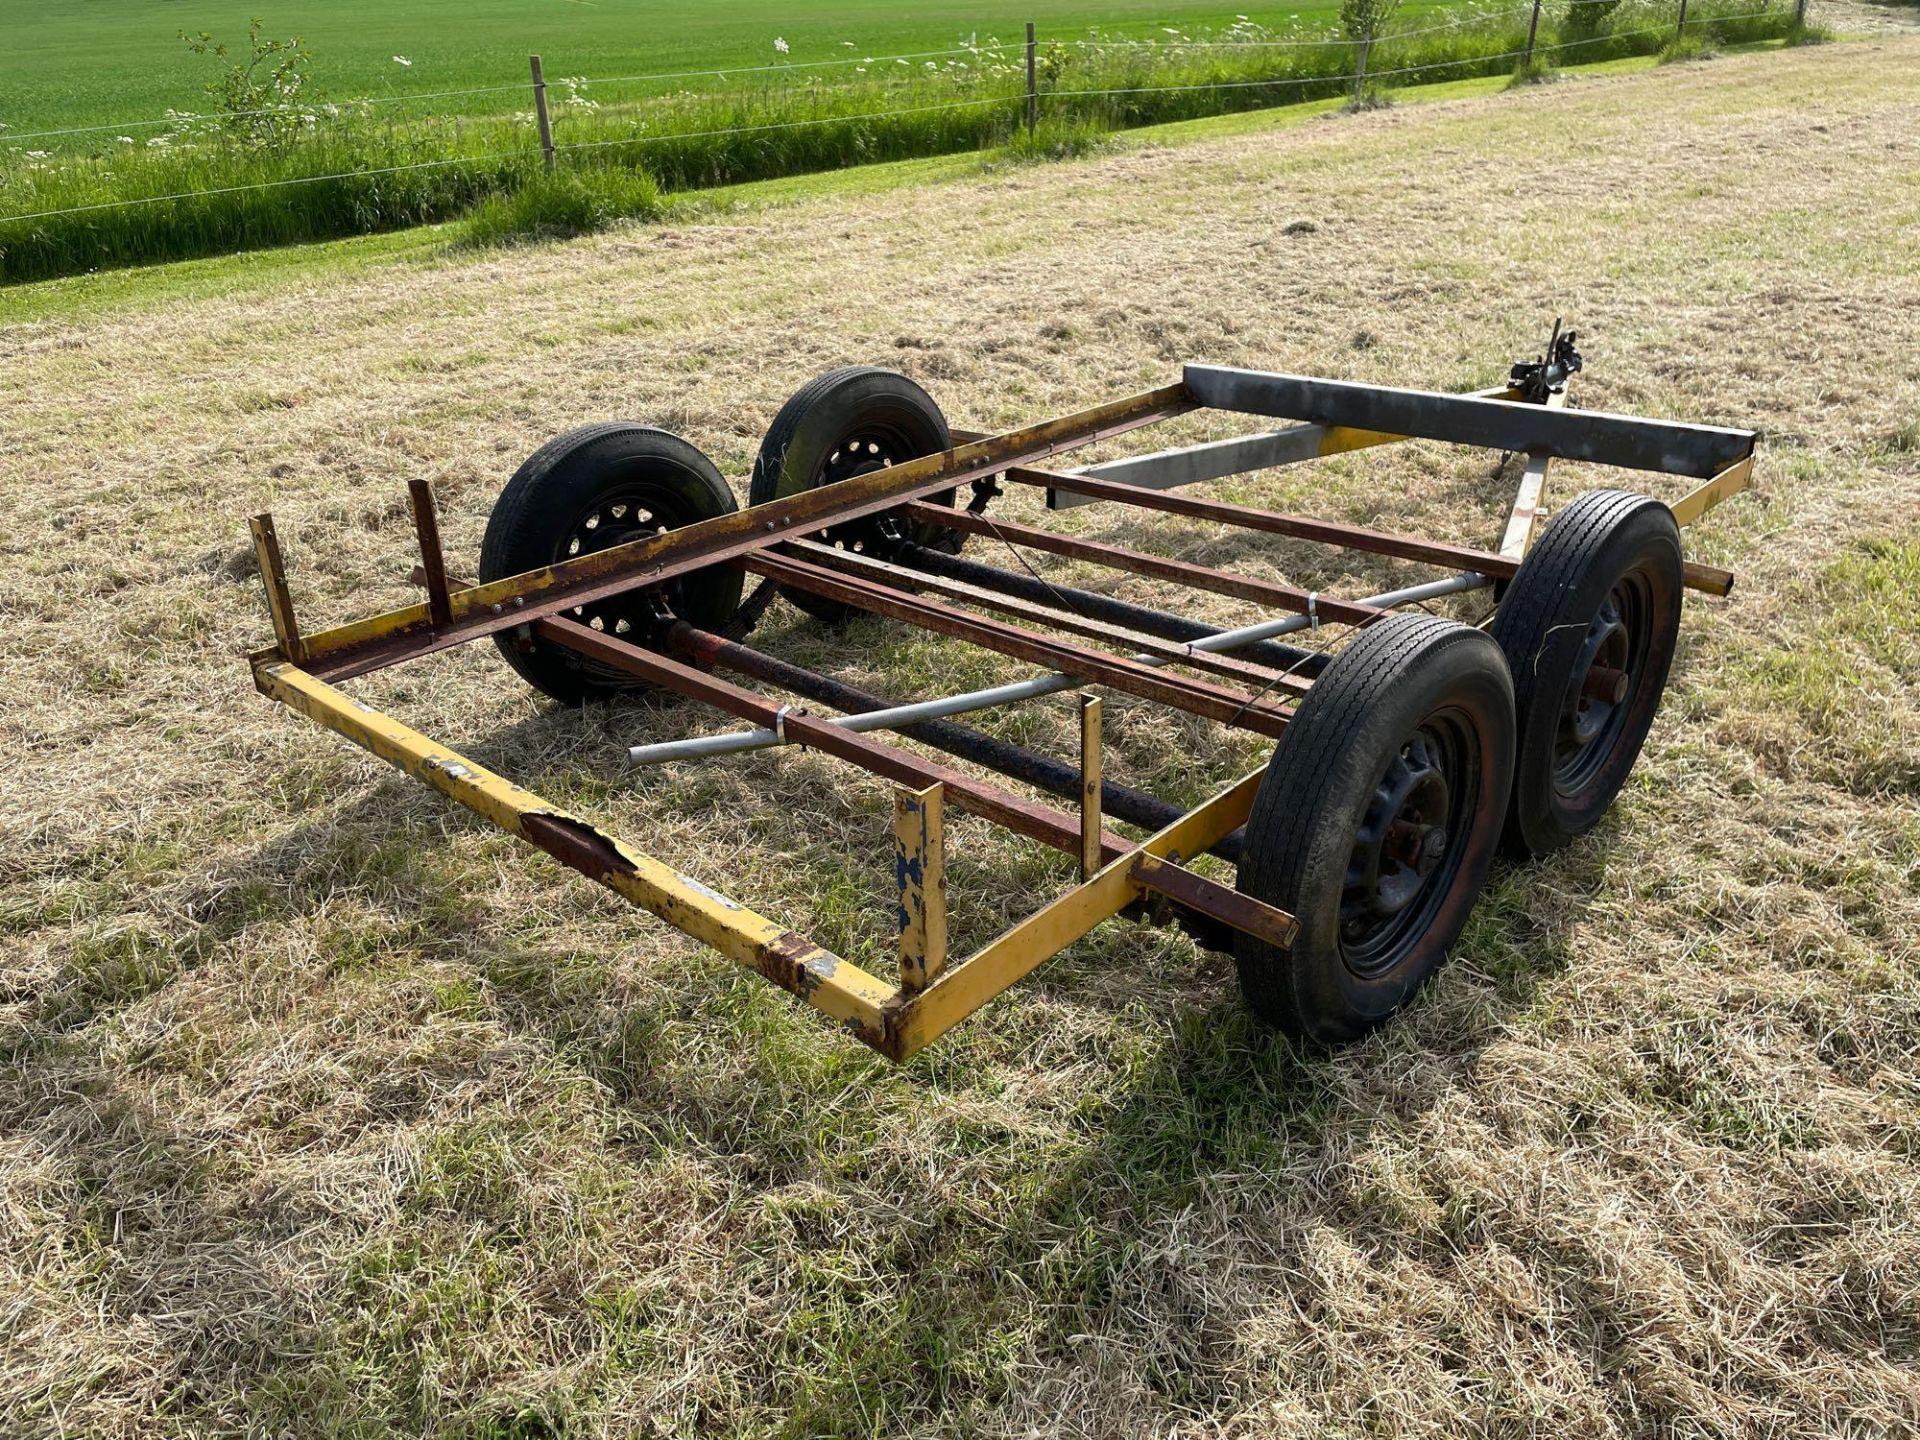 Single axle car trailer frame - Image 4 of 4